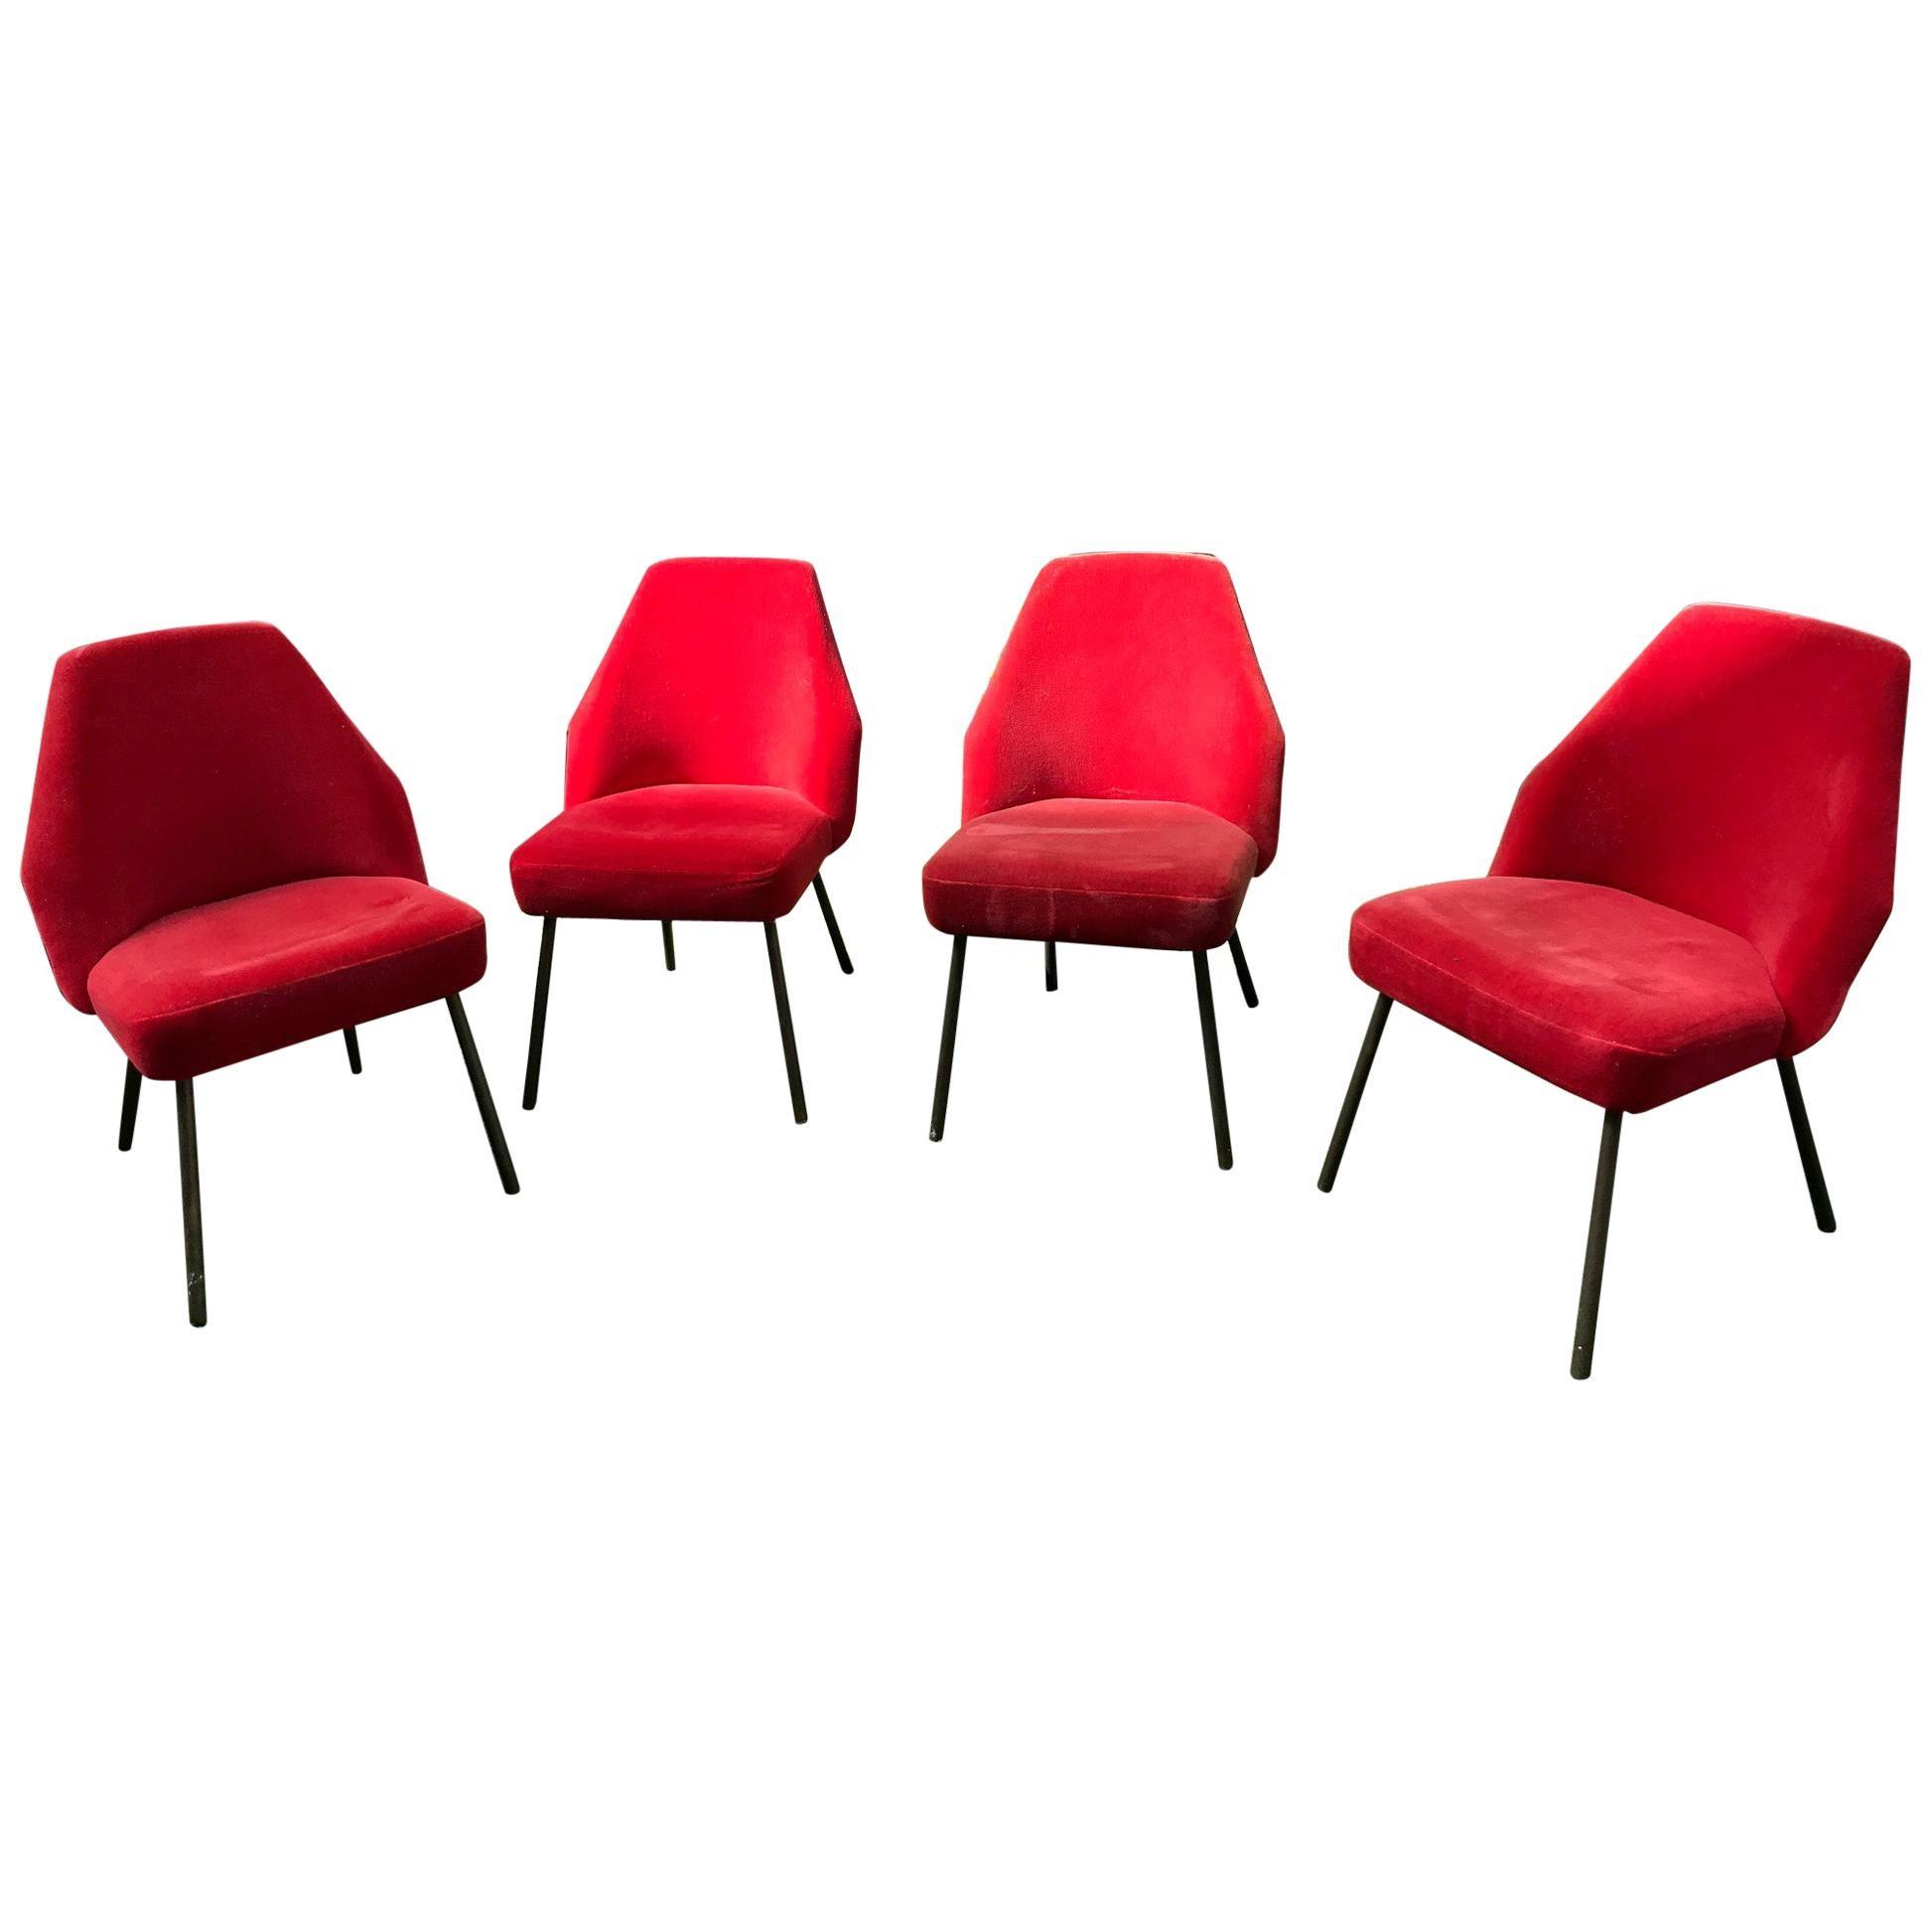 Set of 4 Campanula Chairs by Carlo Pagani for Arflex